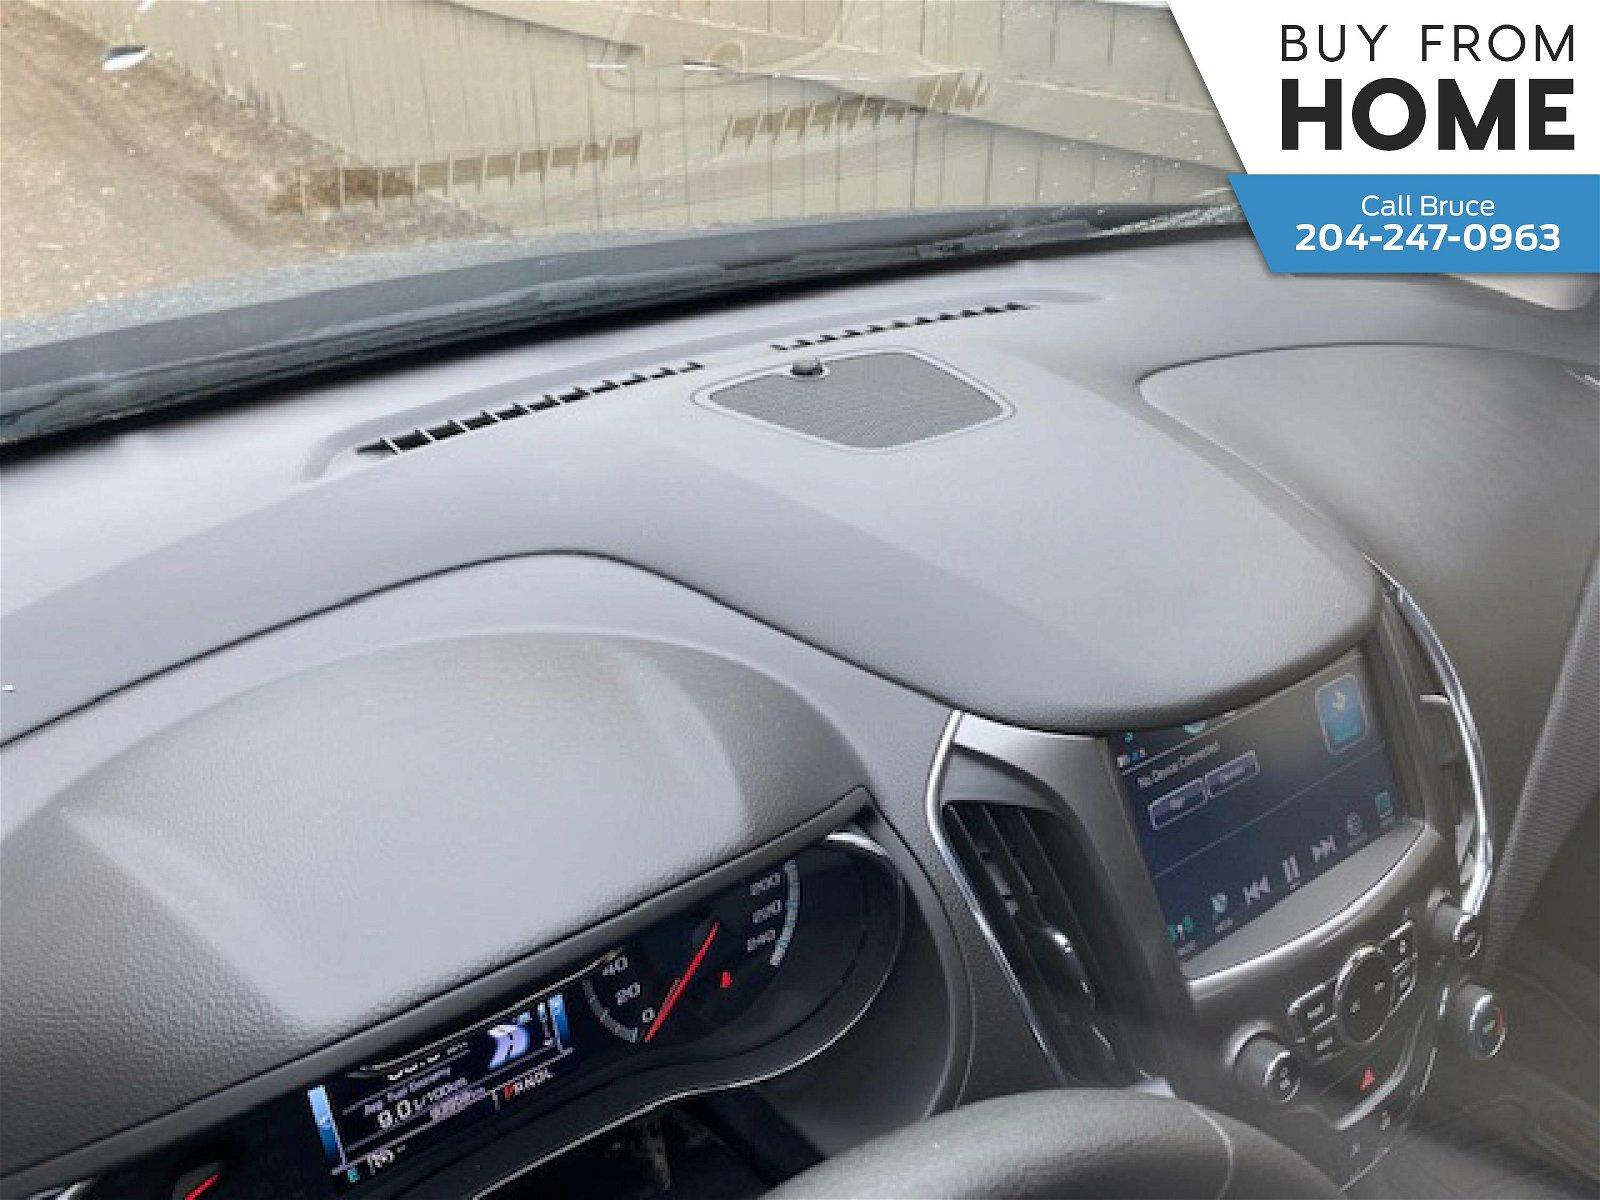 2017 Chevrolet Cruze LT